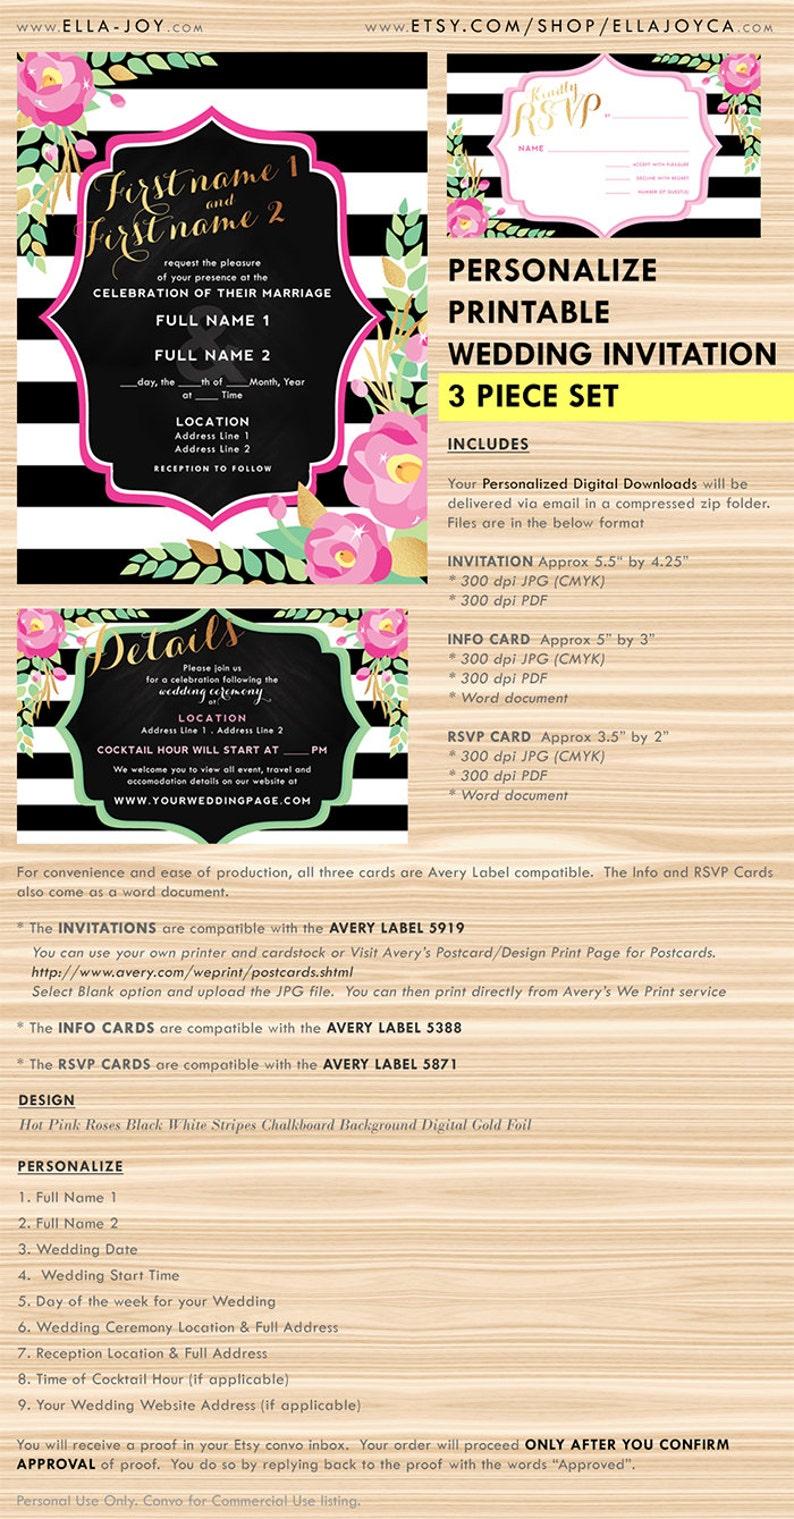 Image 0: Pink And Black Wedding Invitations Blank At Websimilar.org